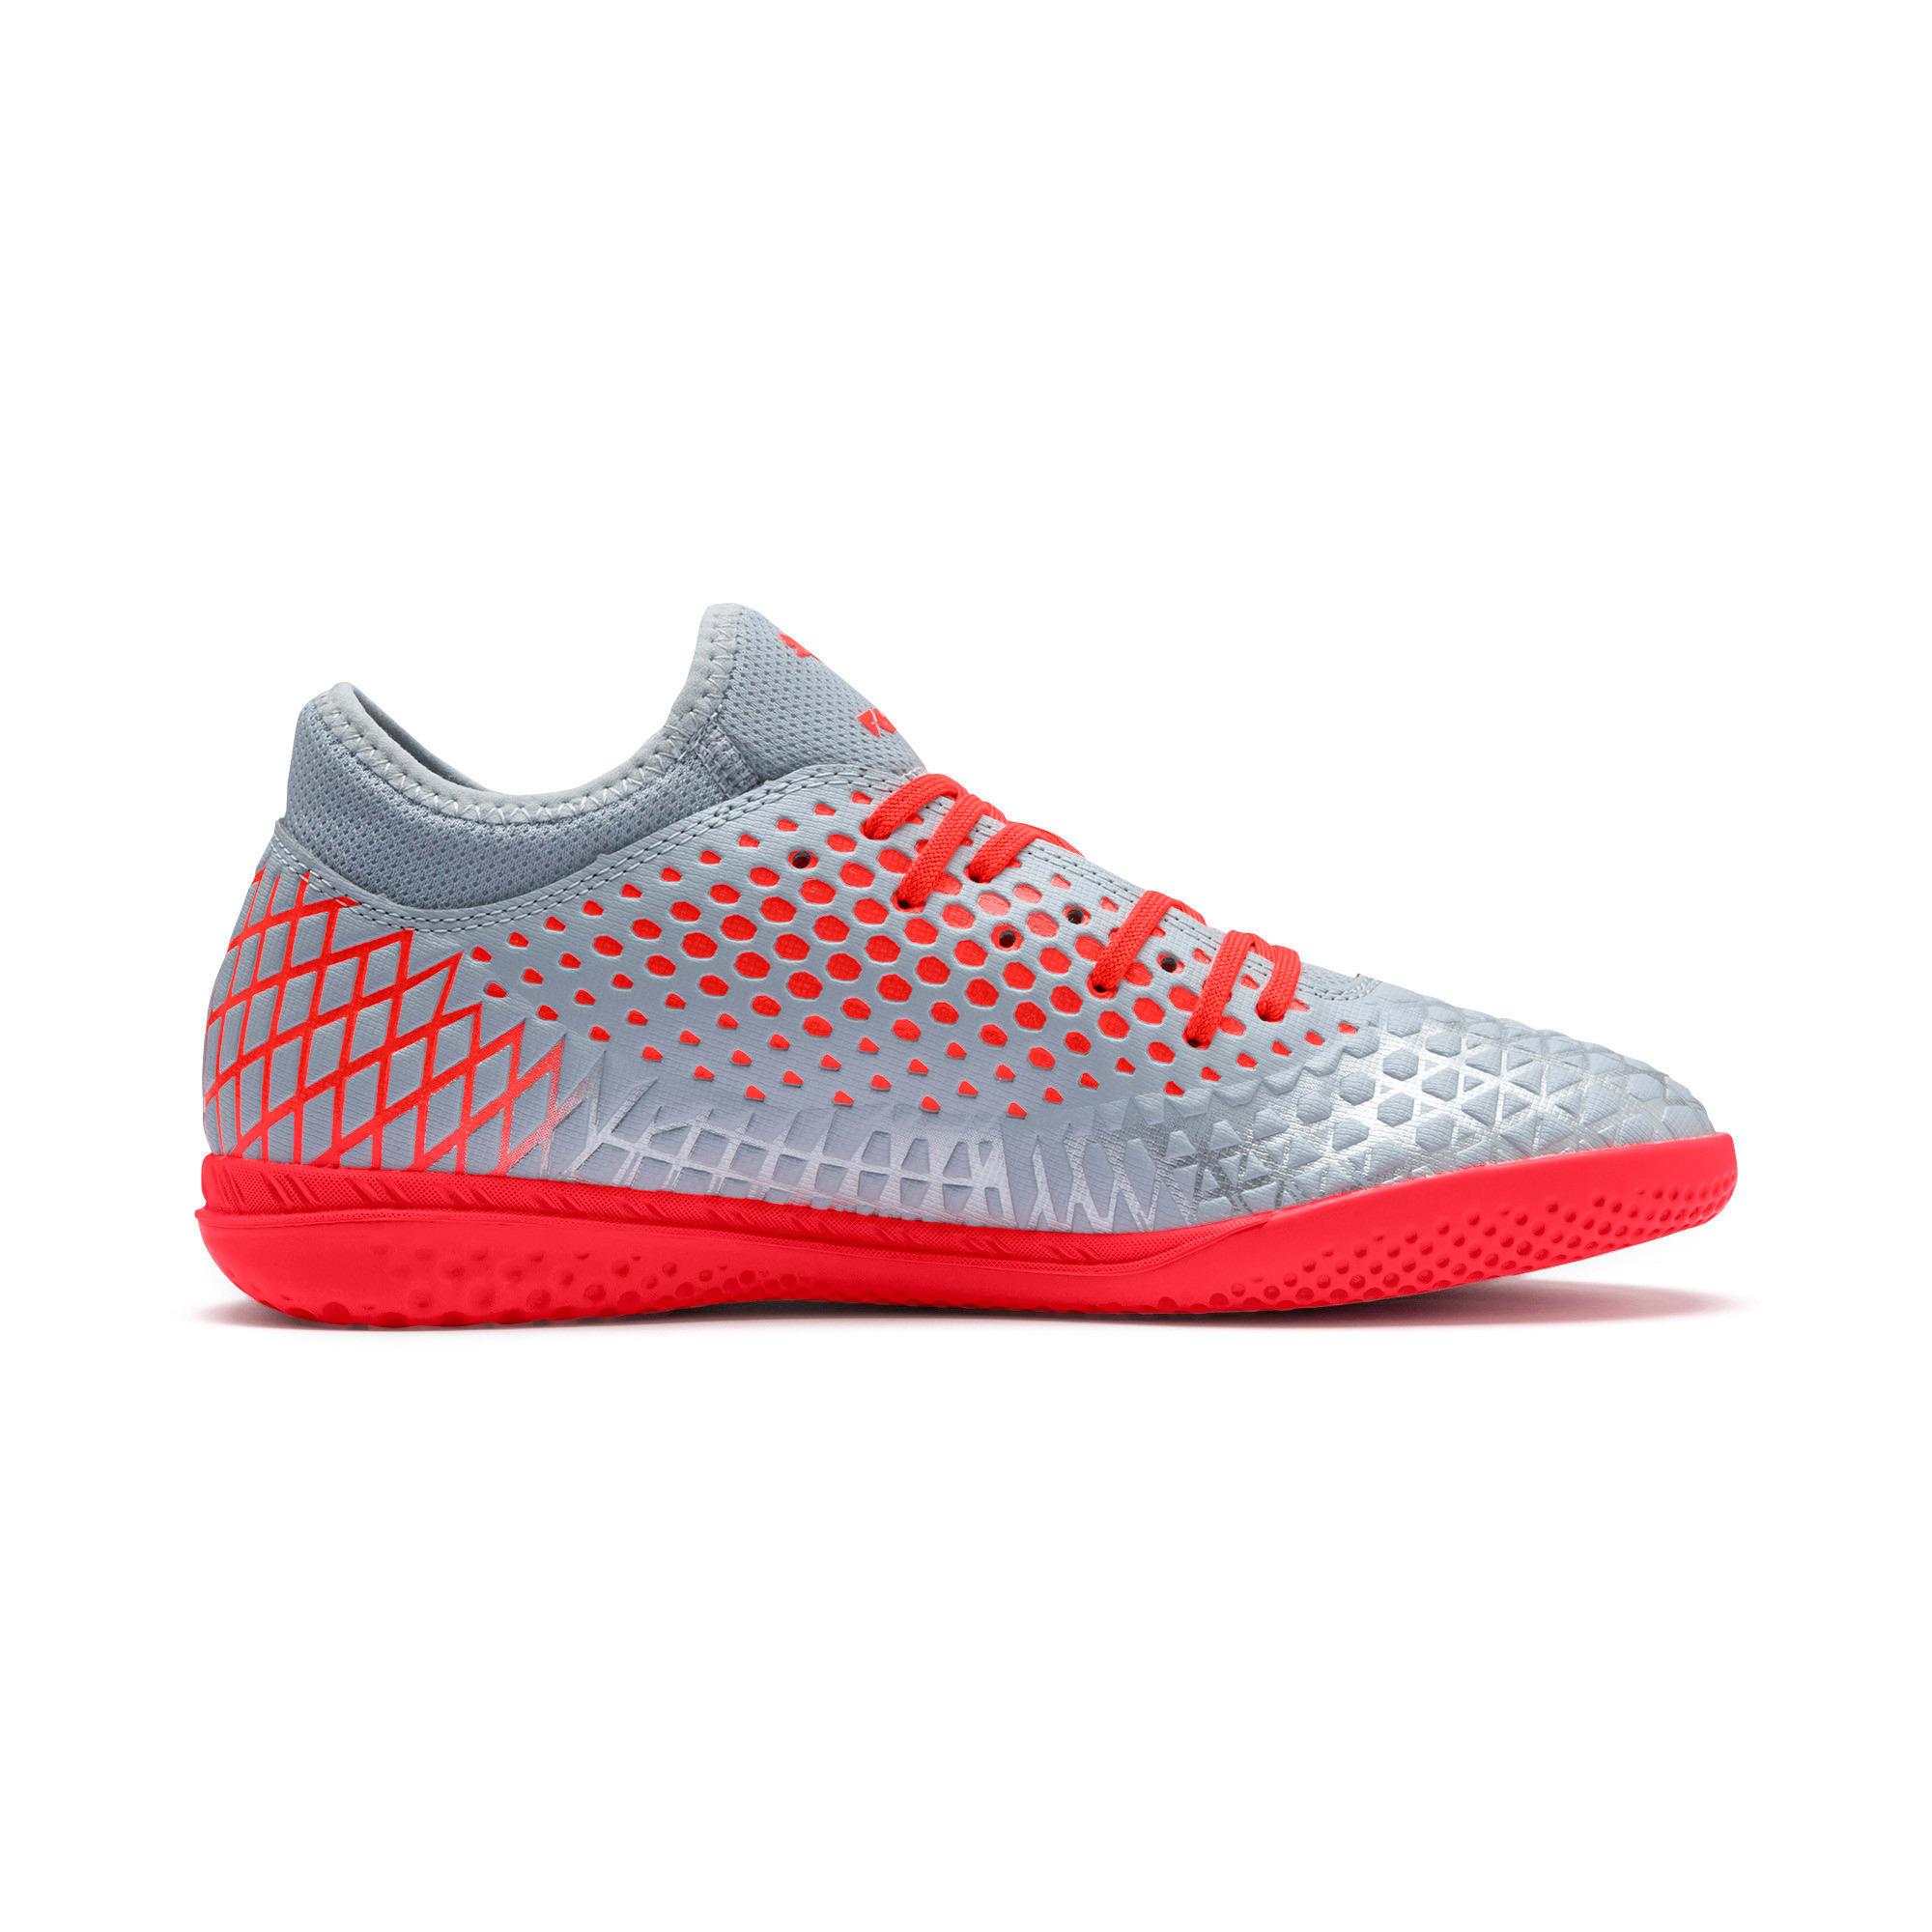 Thumbnail 6 of FUTURE 4.4 IT Men's Soccer Shoes, Glacial Blue-Nrgy Red, medium